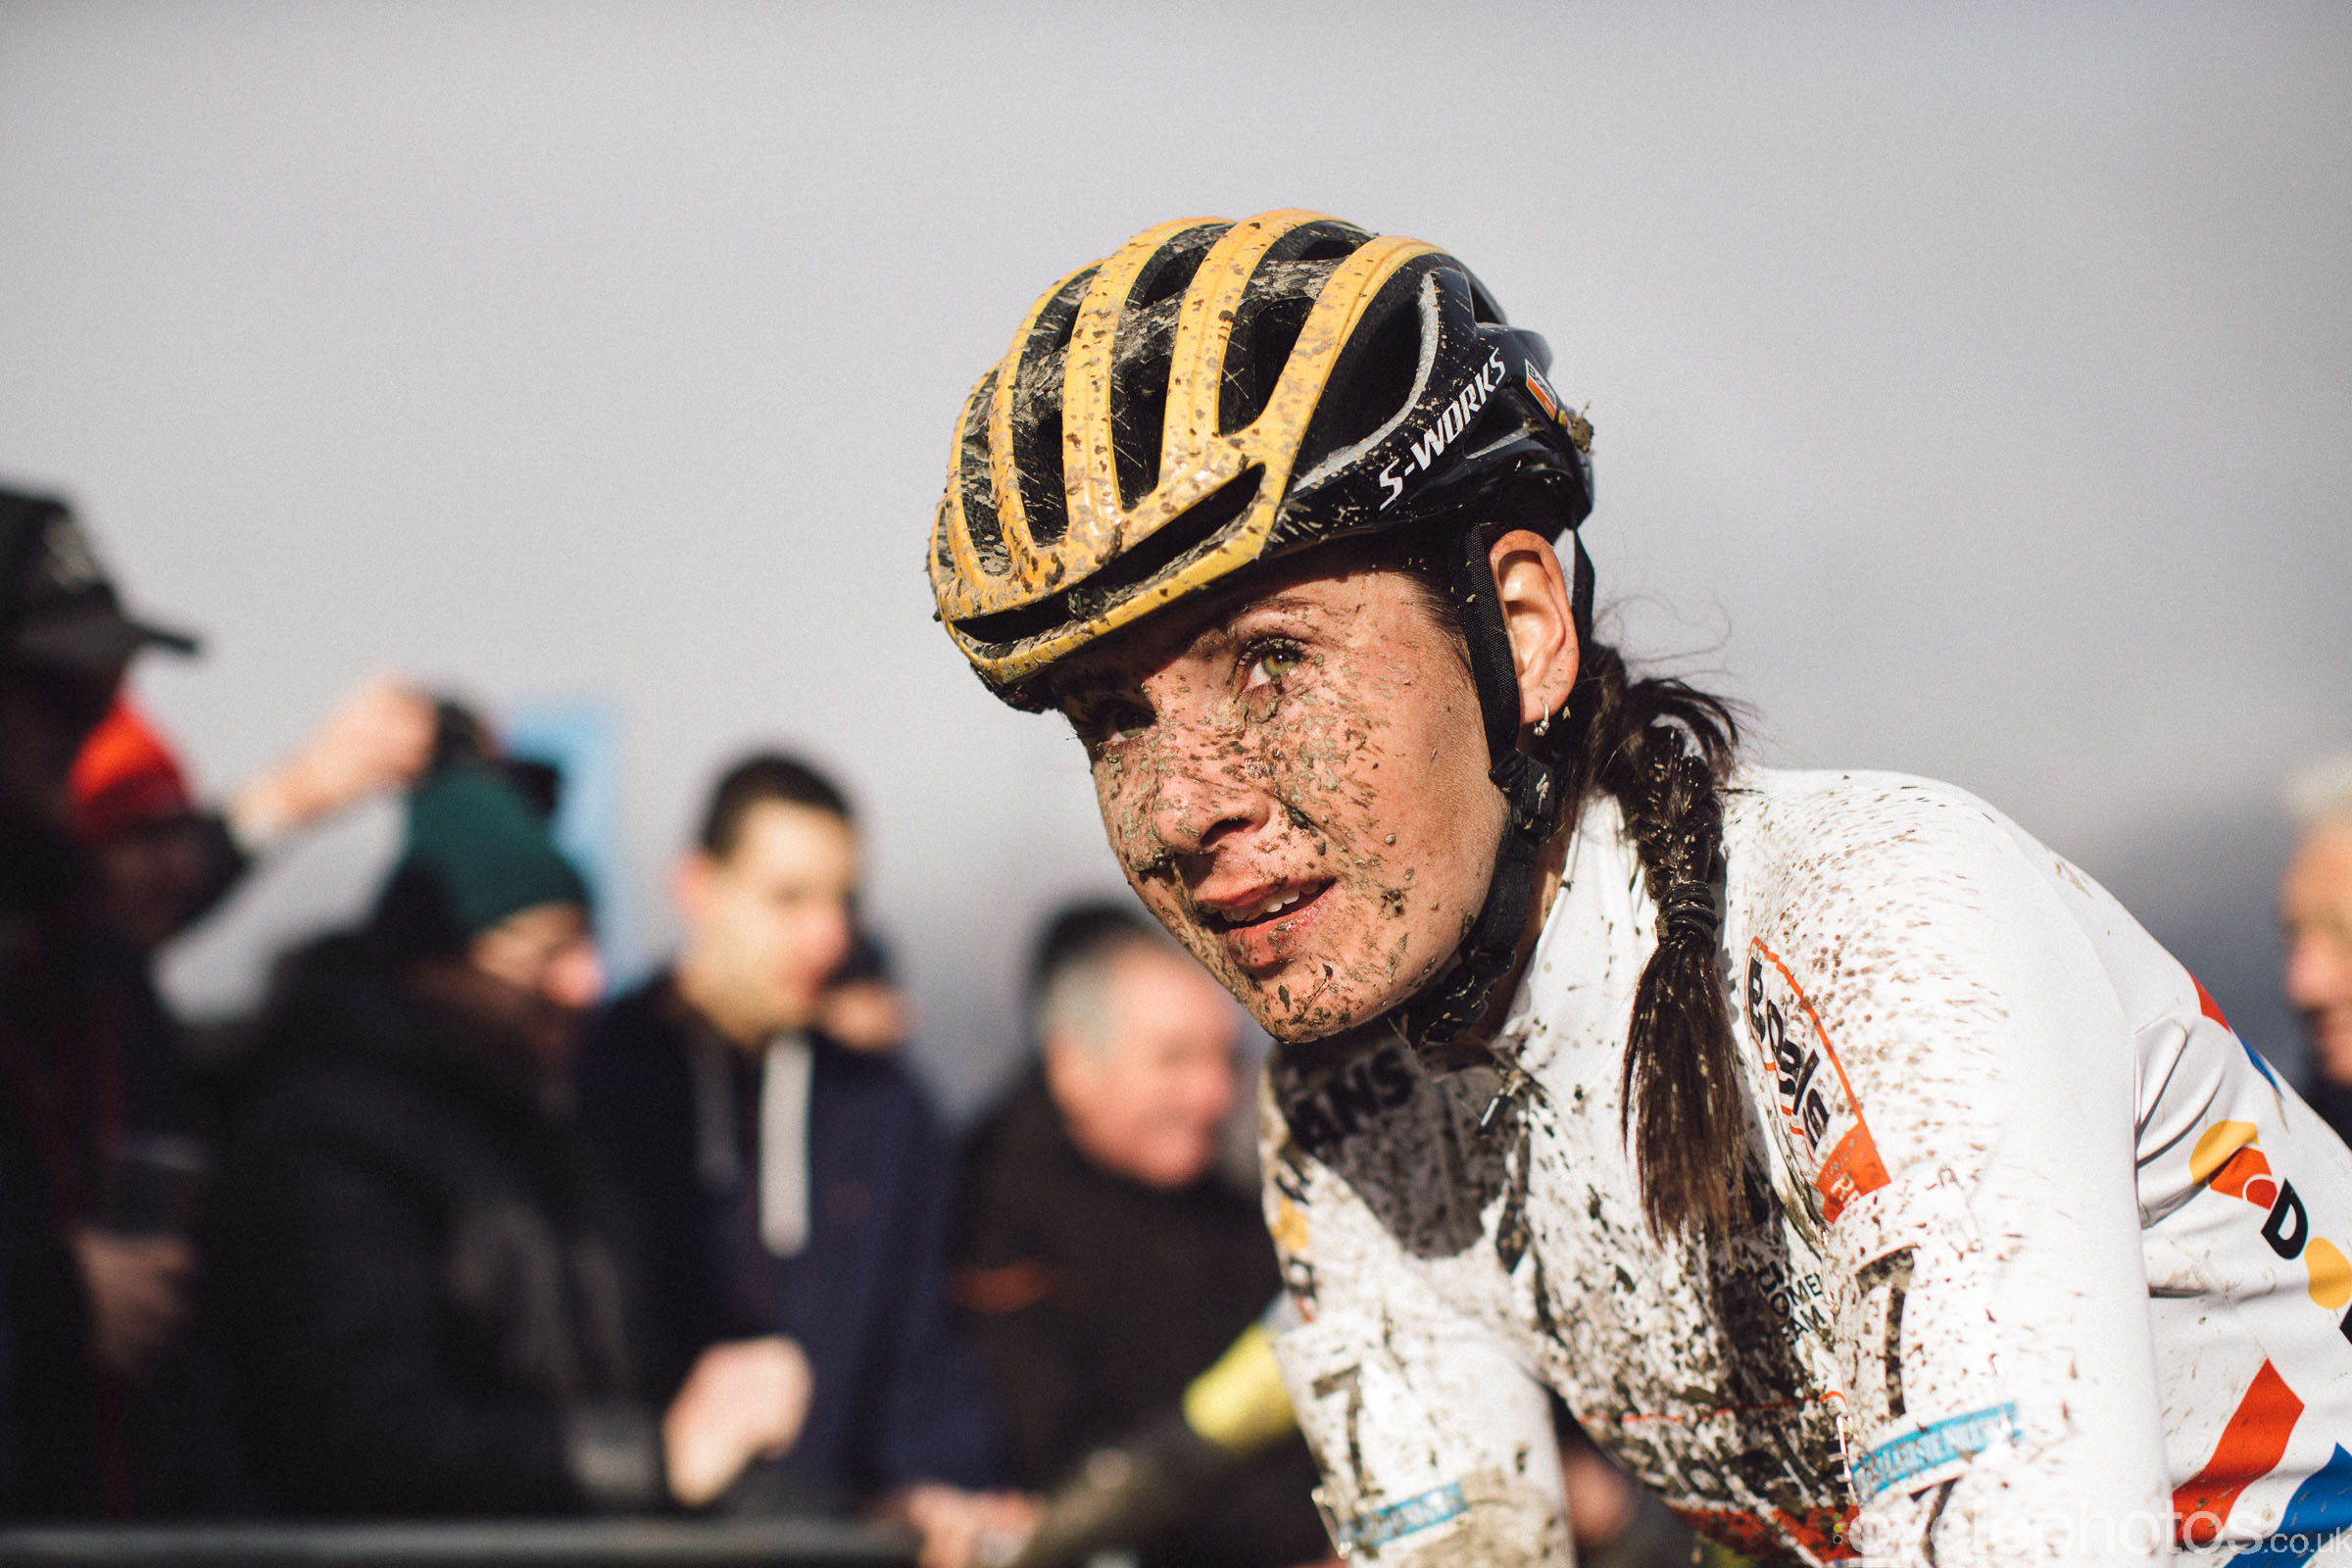 Nikki Brammeier at Cyclocross Superprestige #5 - Gavere, BEL